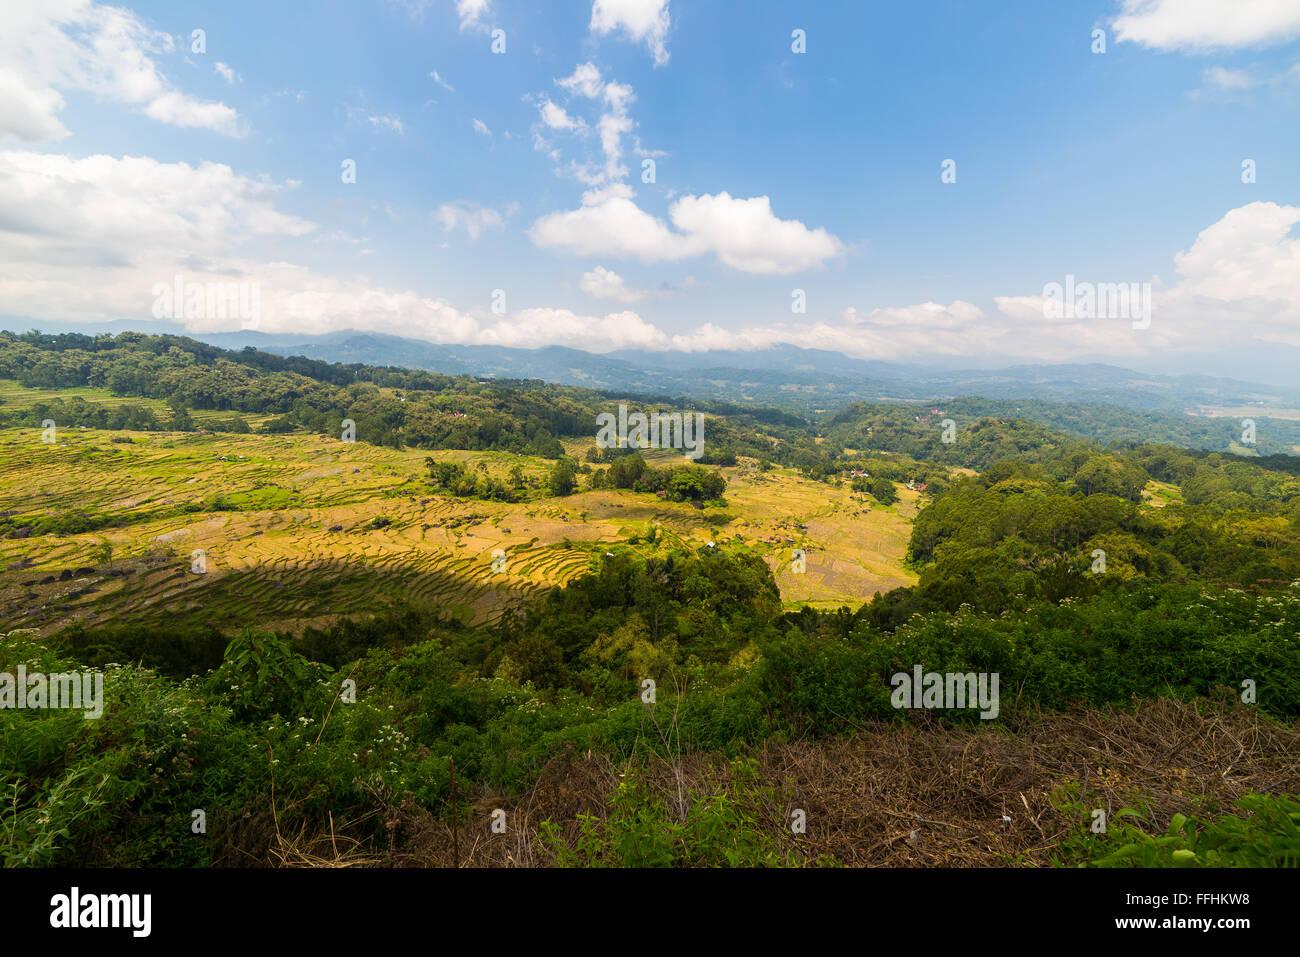 Expansive landscape and bright rice fields on the mountains of Batutumonga, Tana Toraja, South Sulawesi, upgrowing - Stock Image